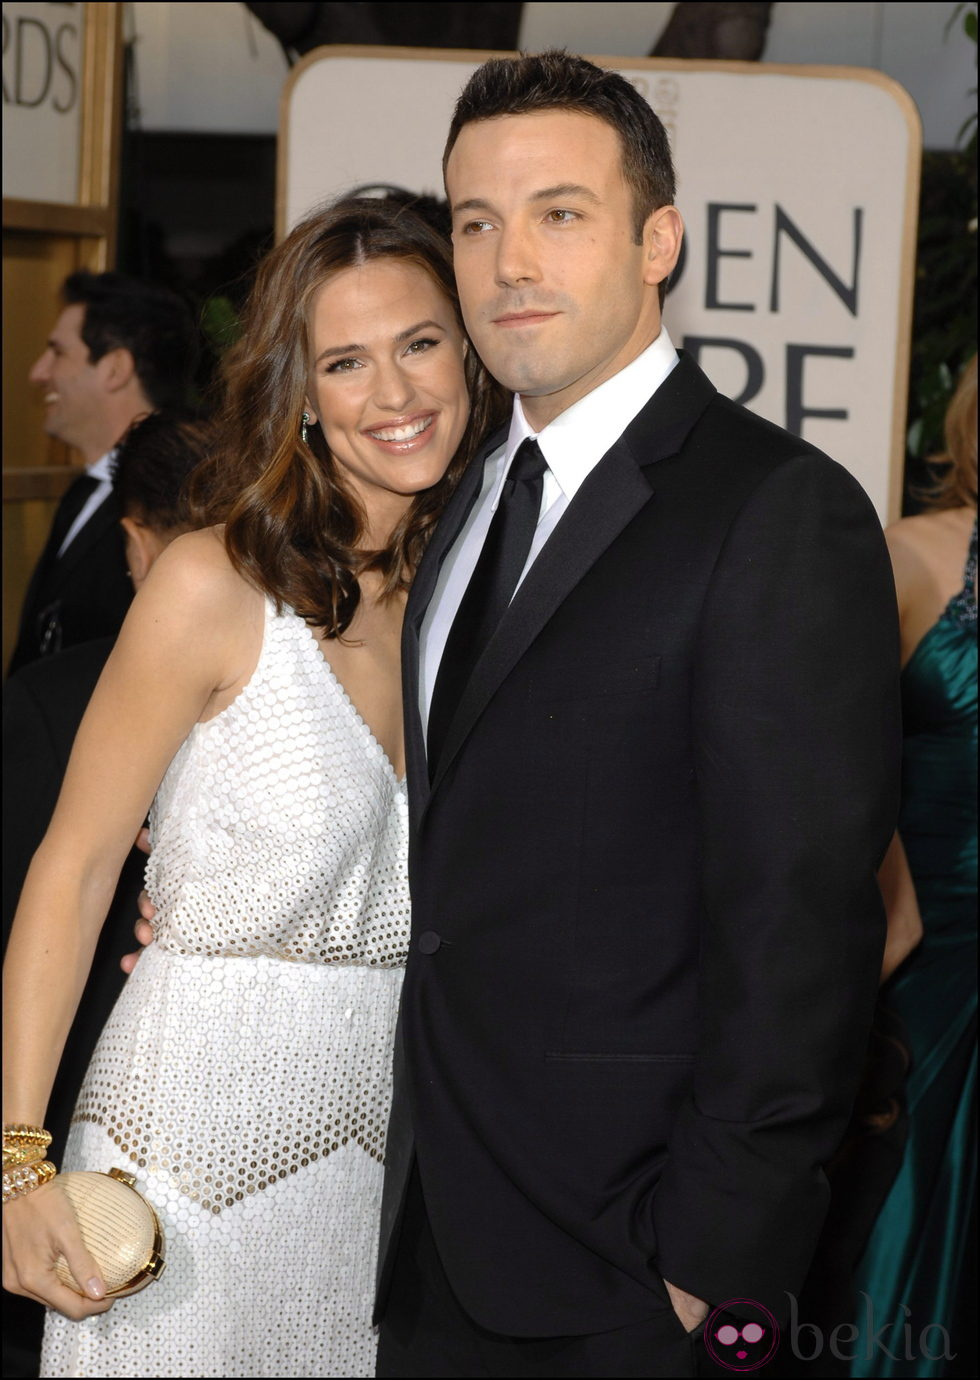 Jennifer Garner y Ben Affleck en una gala